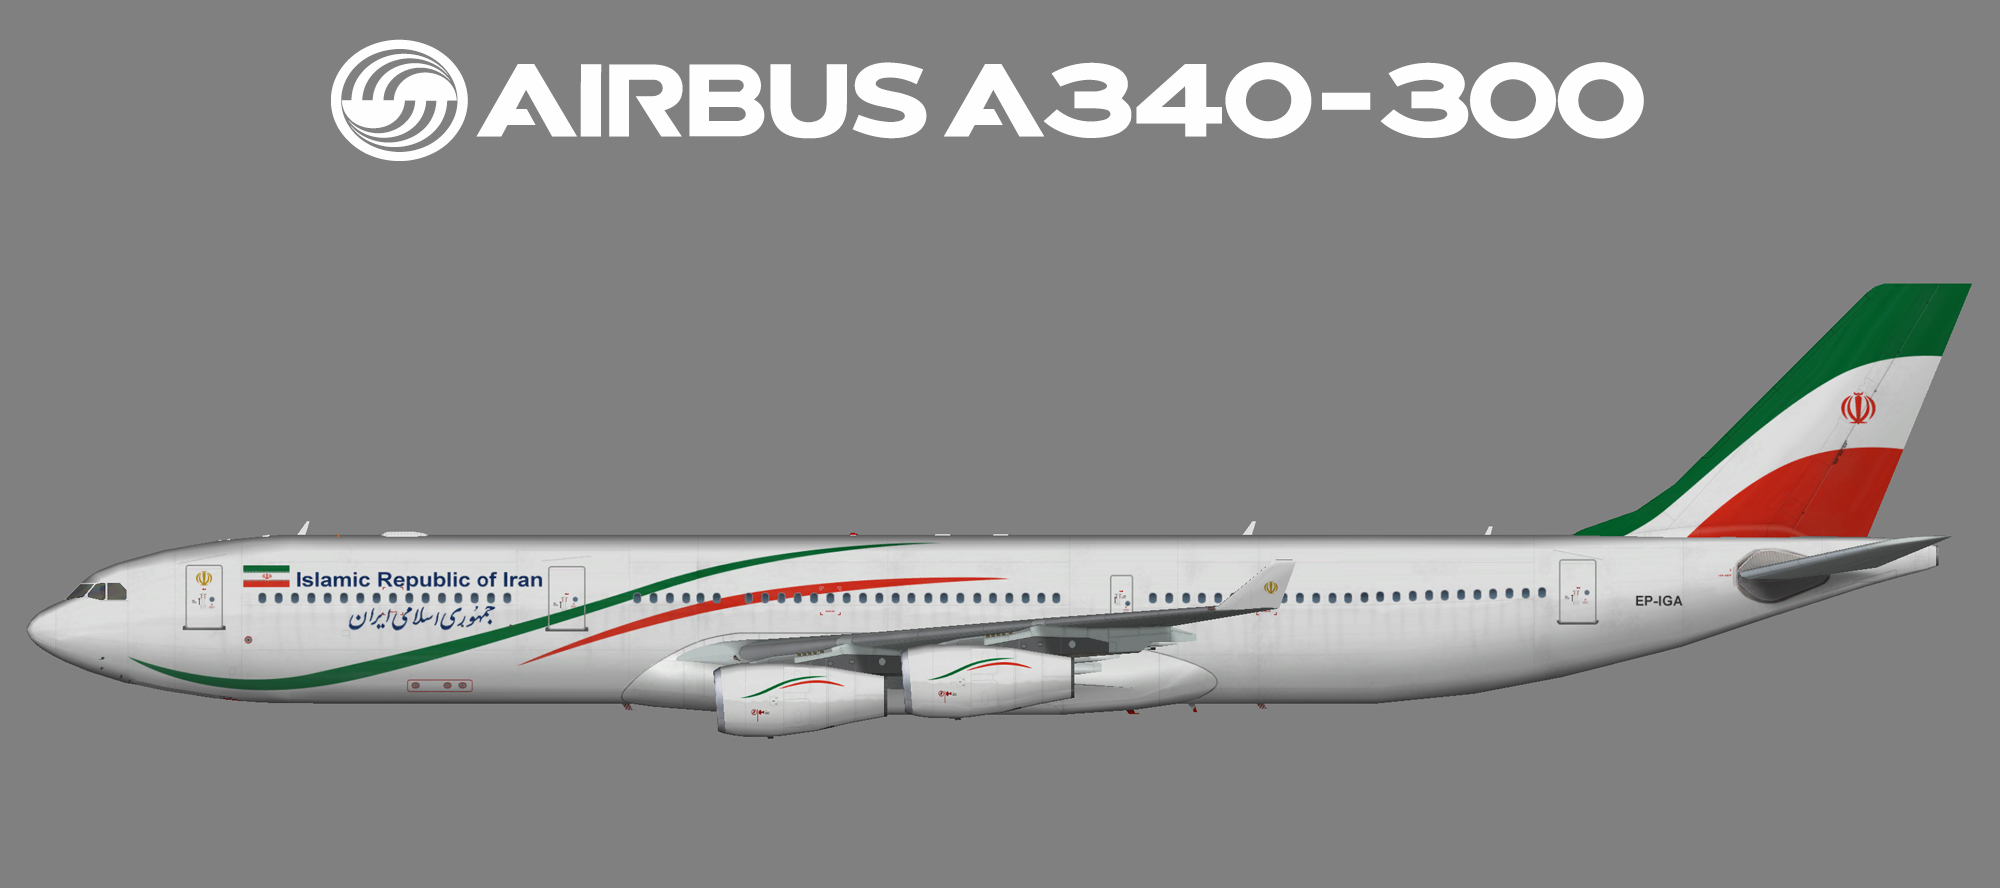 Islamic Republic of Iran Airbus A340-300